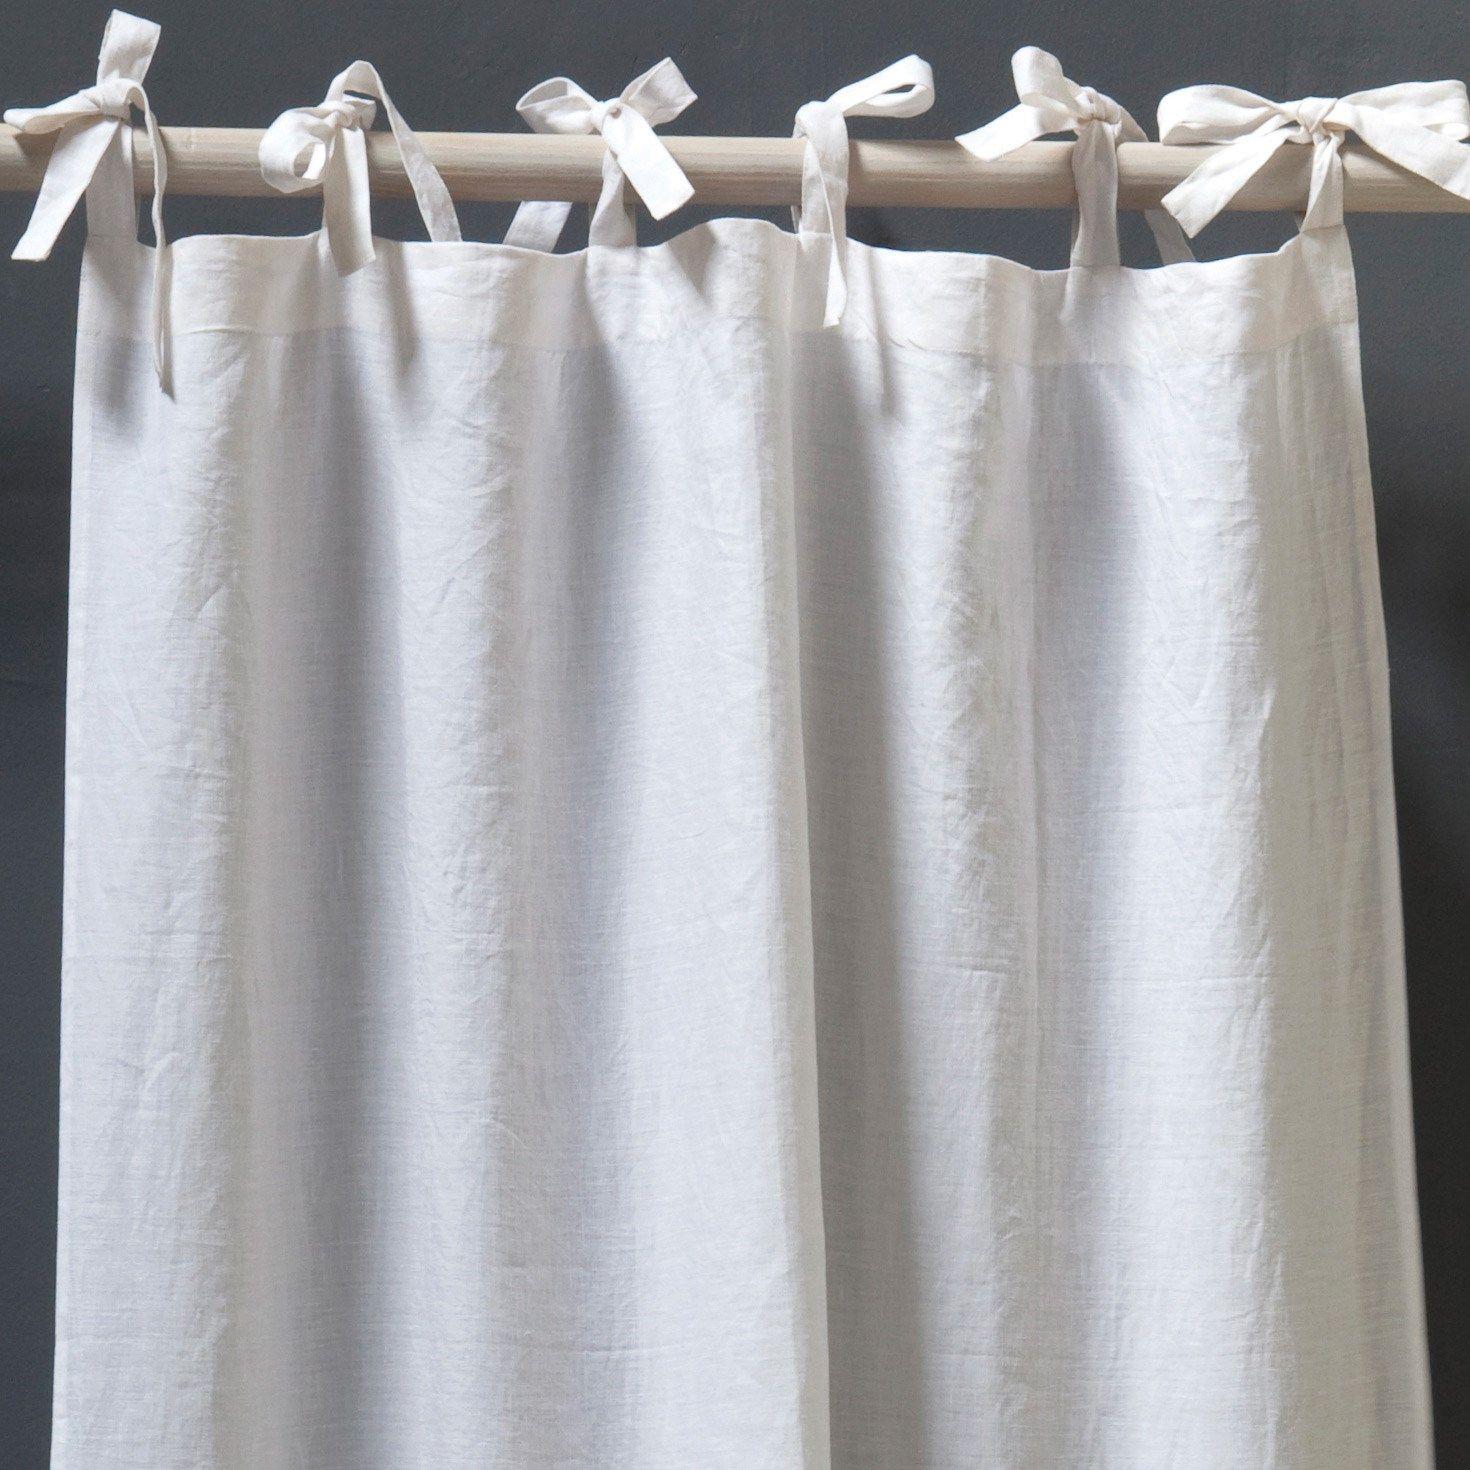 Pom Pom At Home Curtain Panel Tie Top Organic Linen Linen